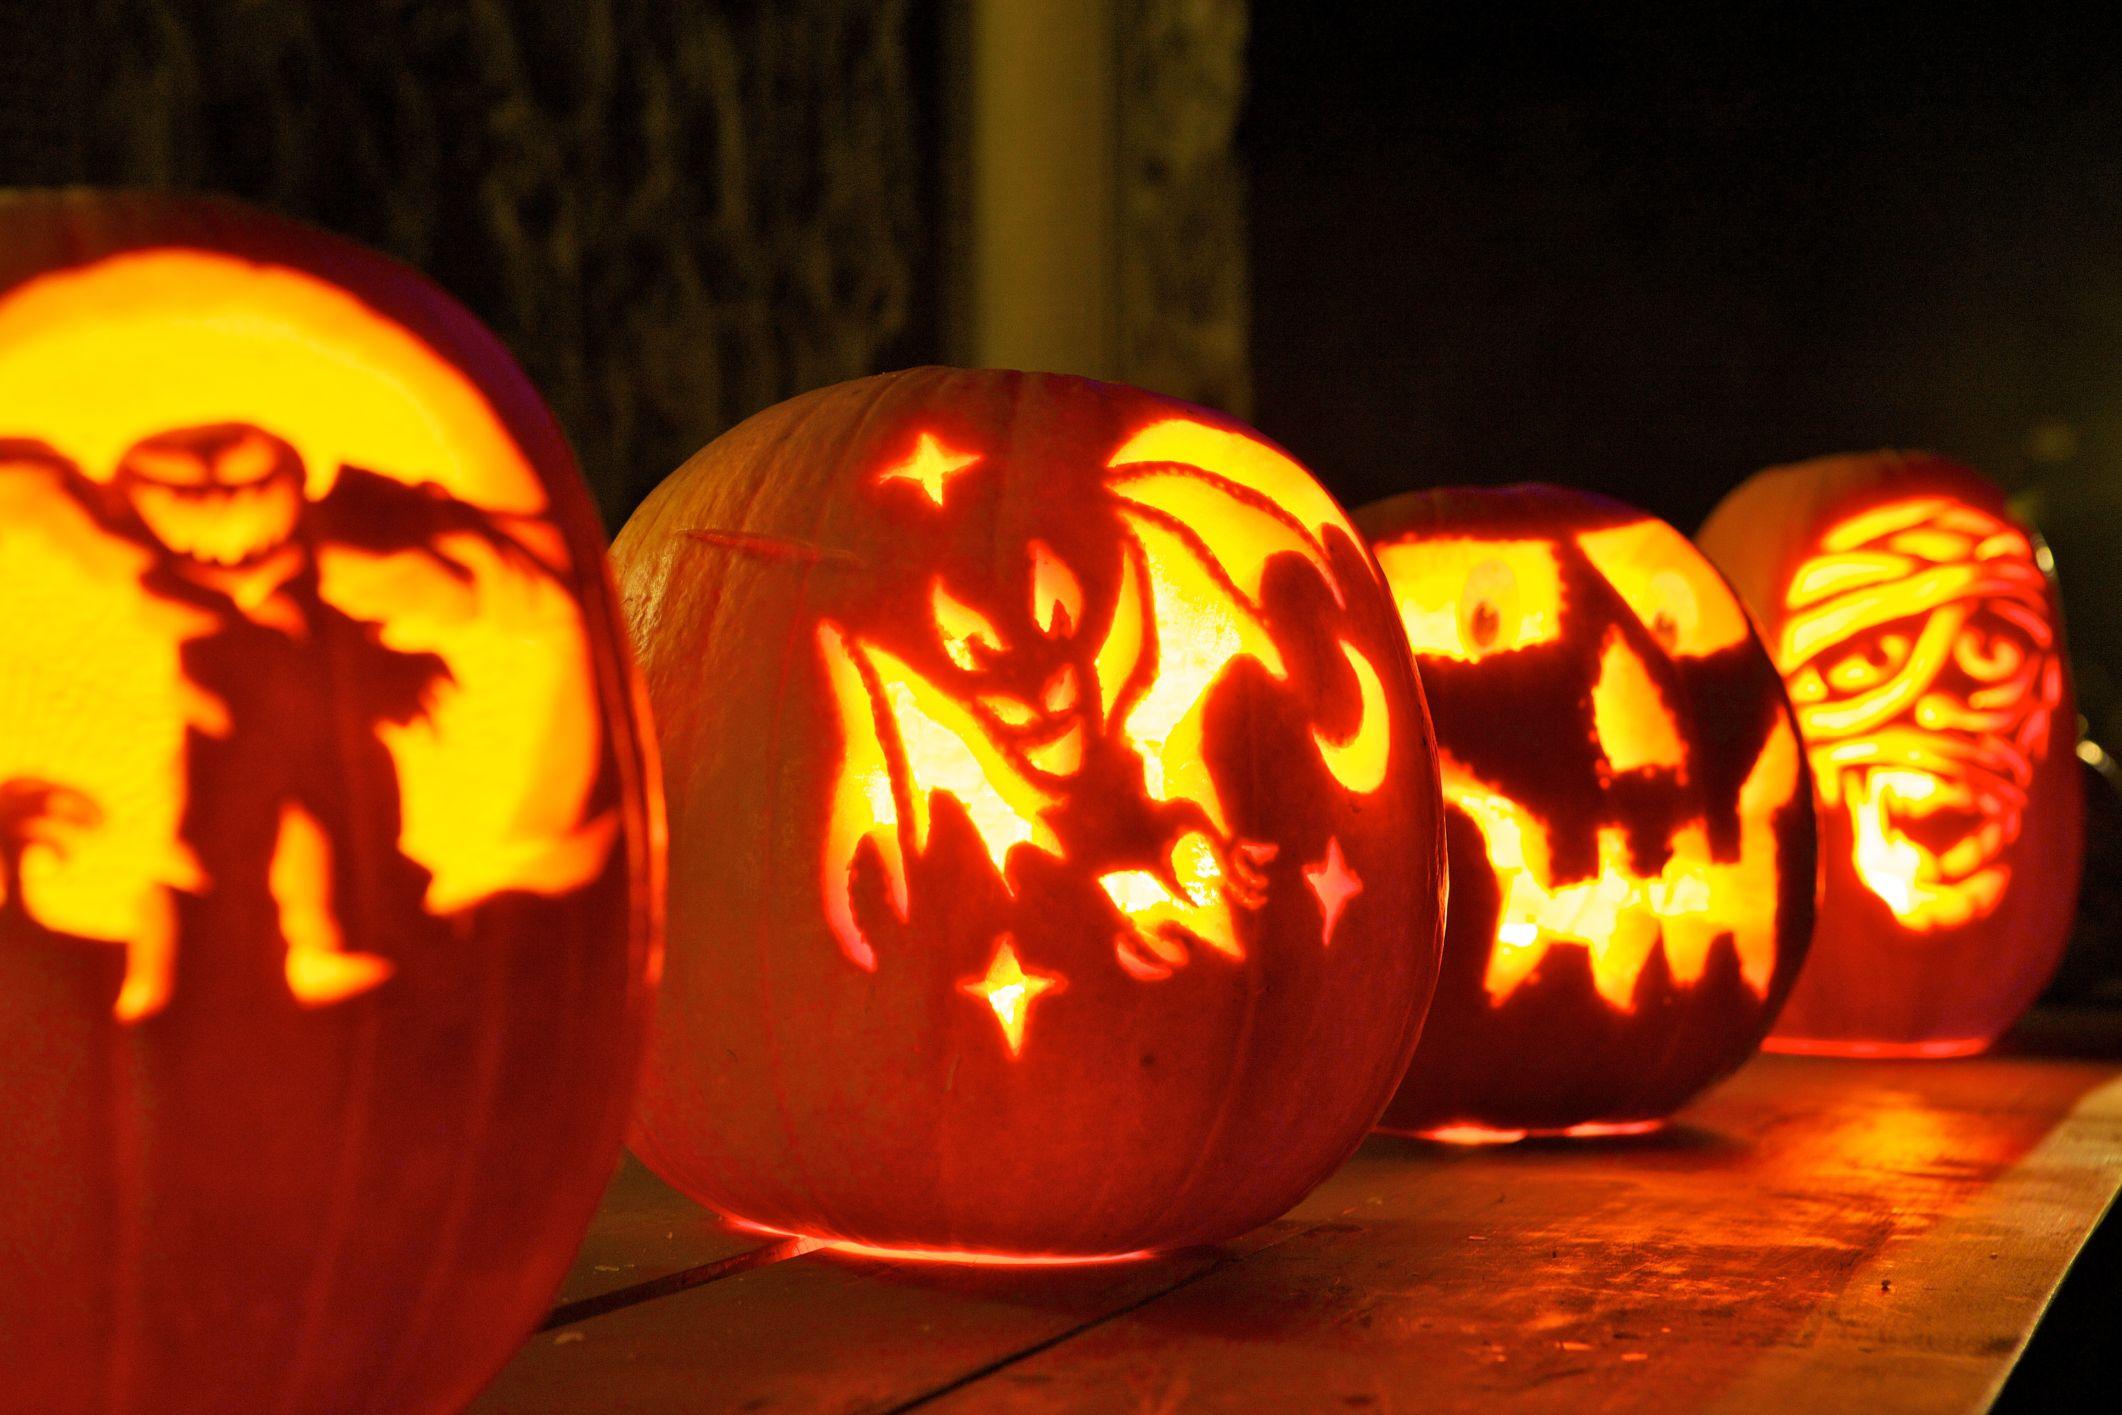 Why Do We Carve Pumpkins On Halloween